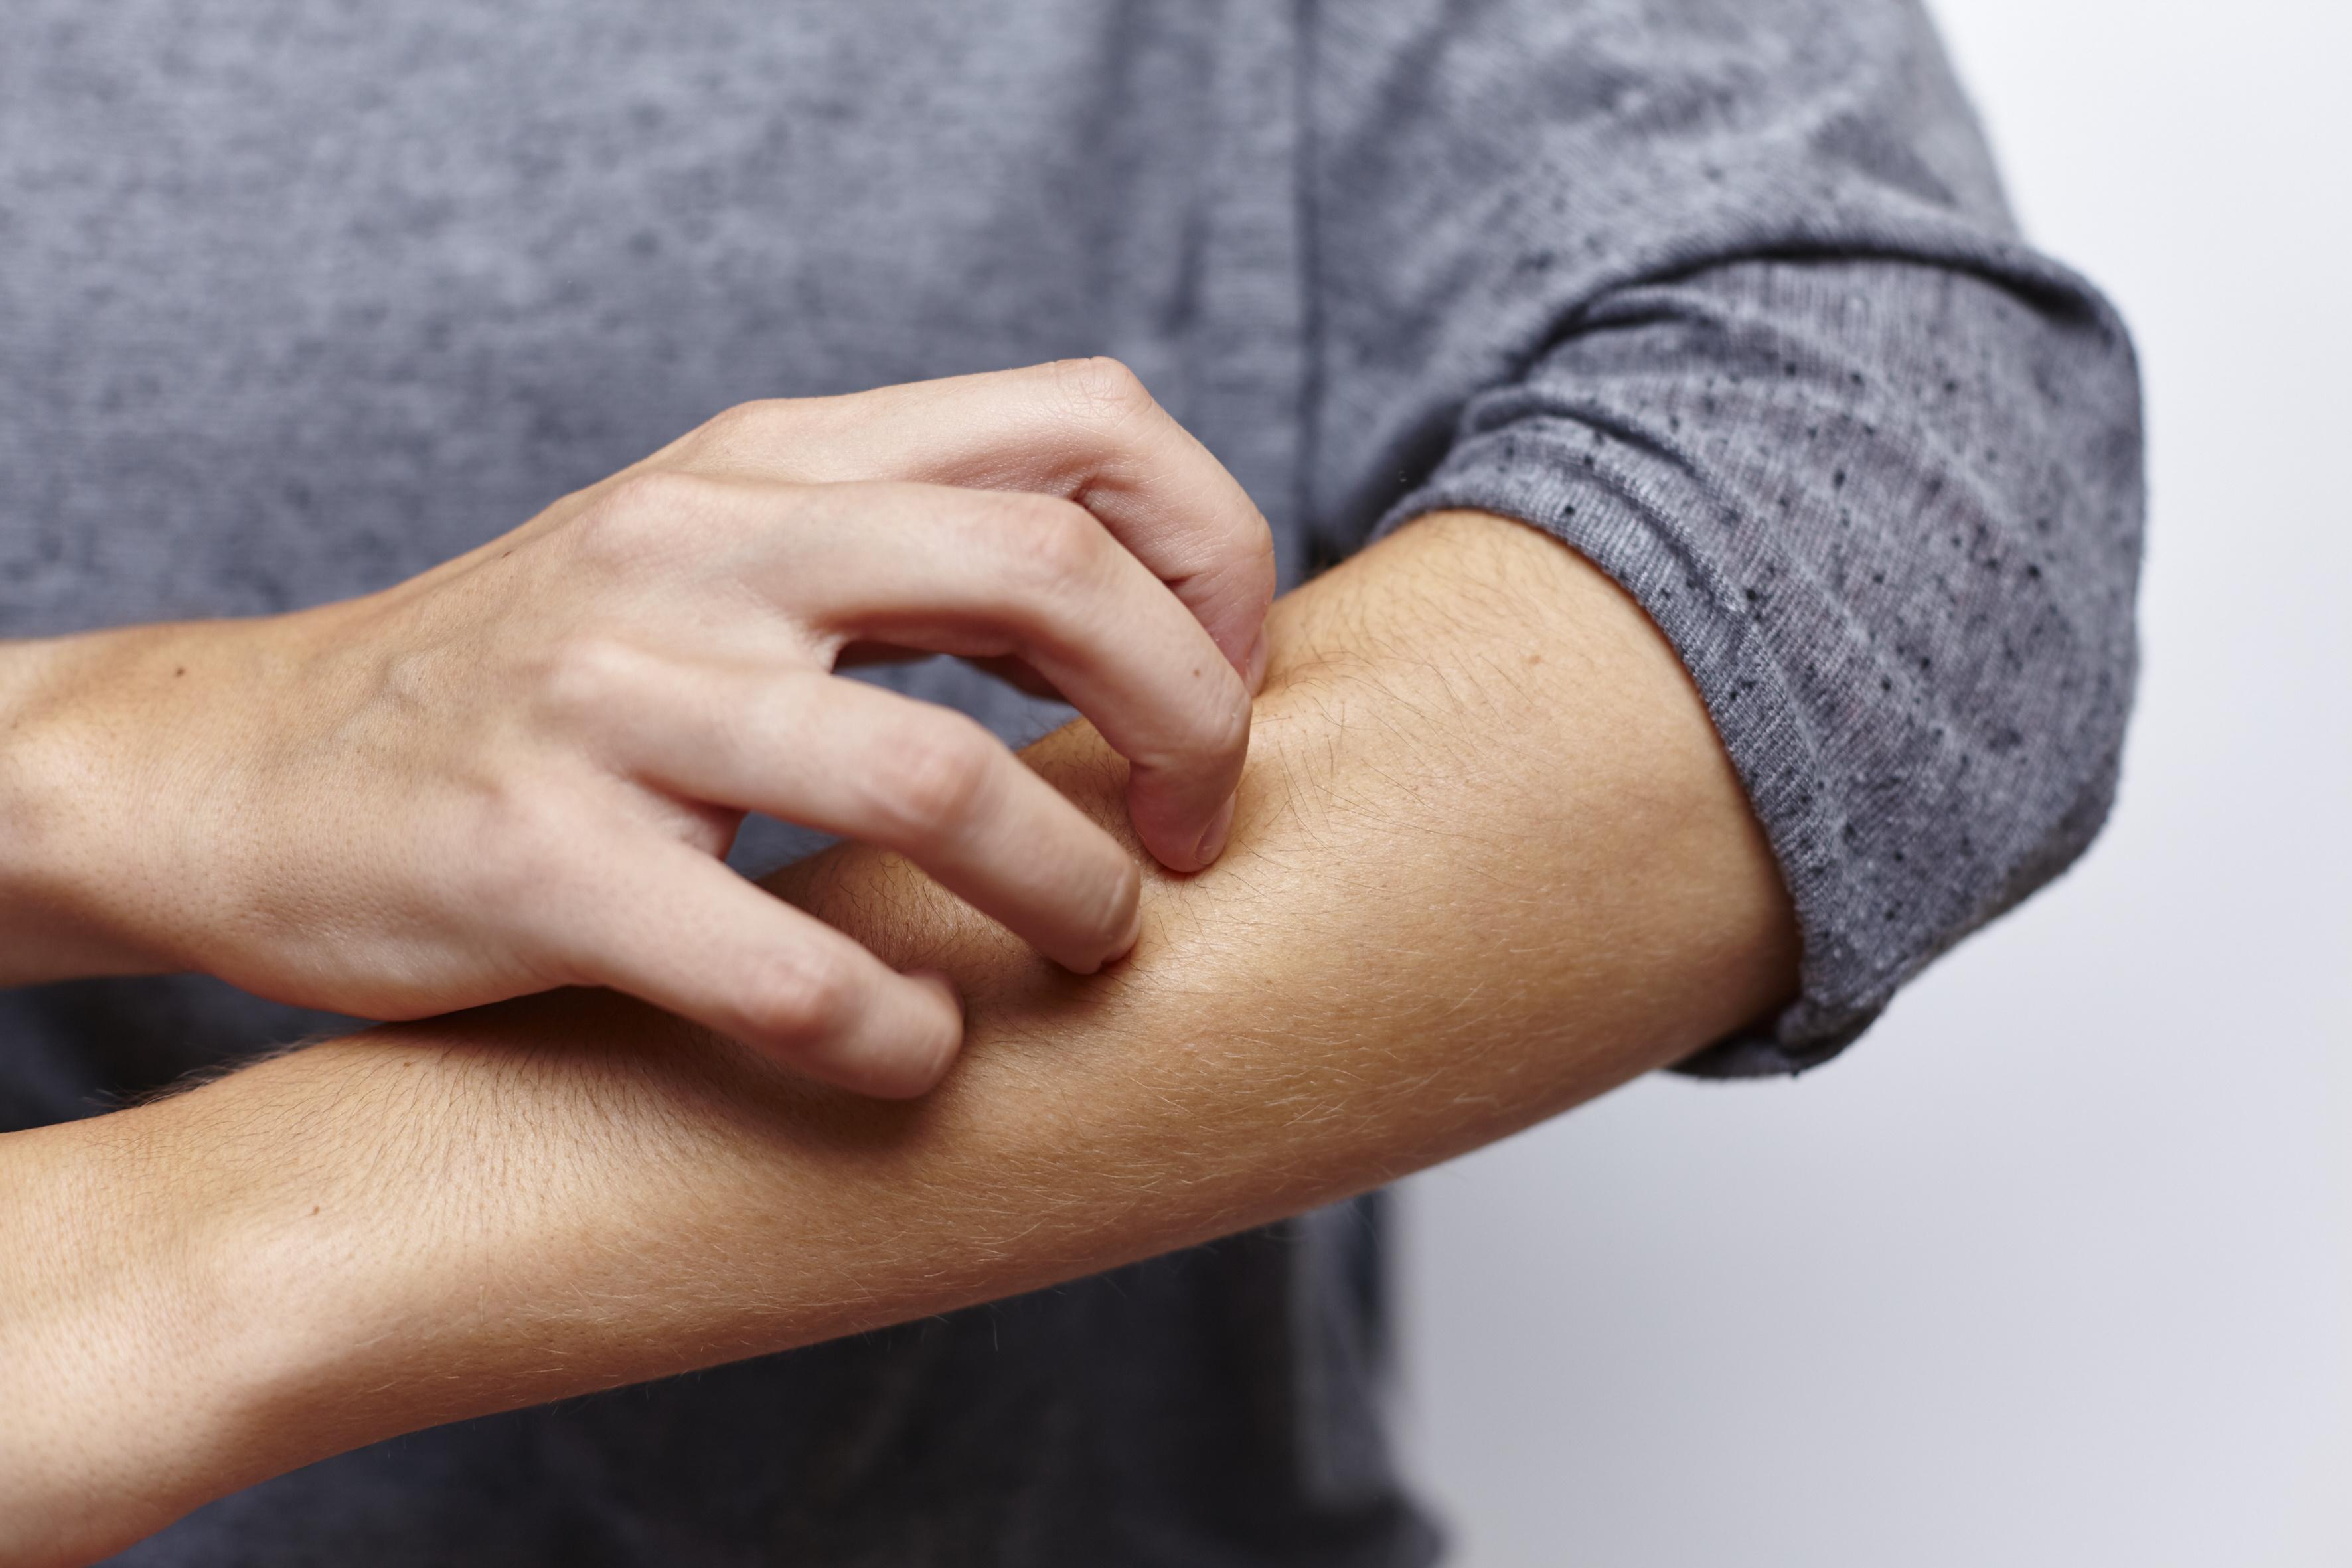 Armbeuge lymphknoten Erkennen ob